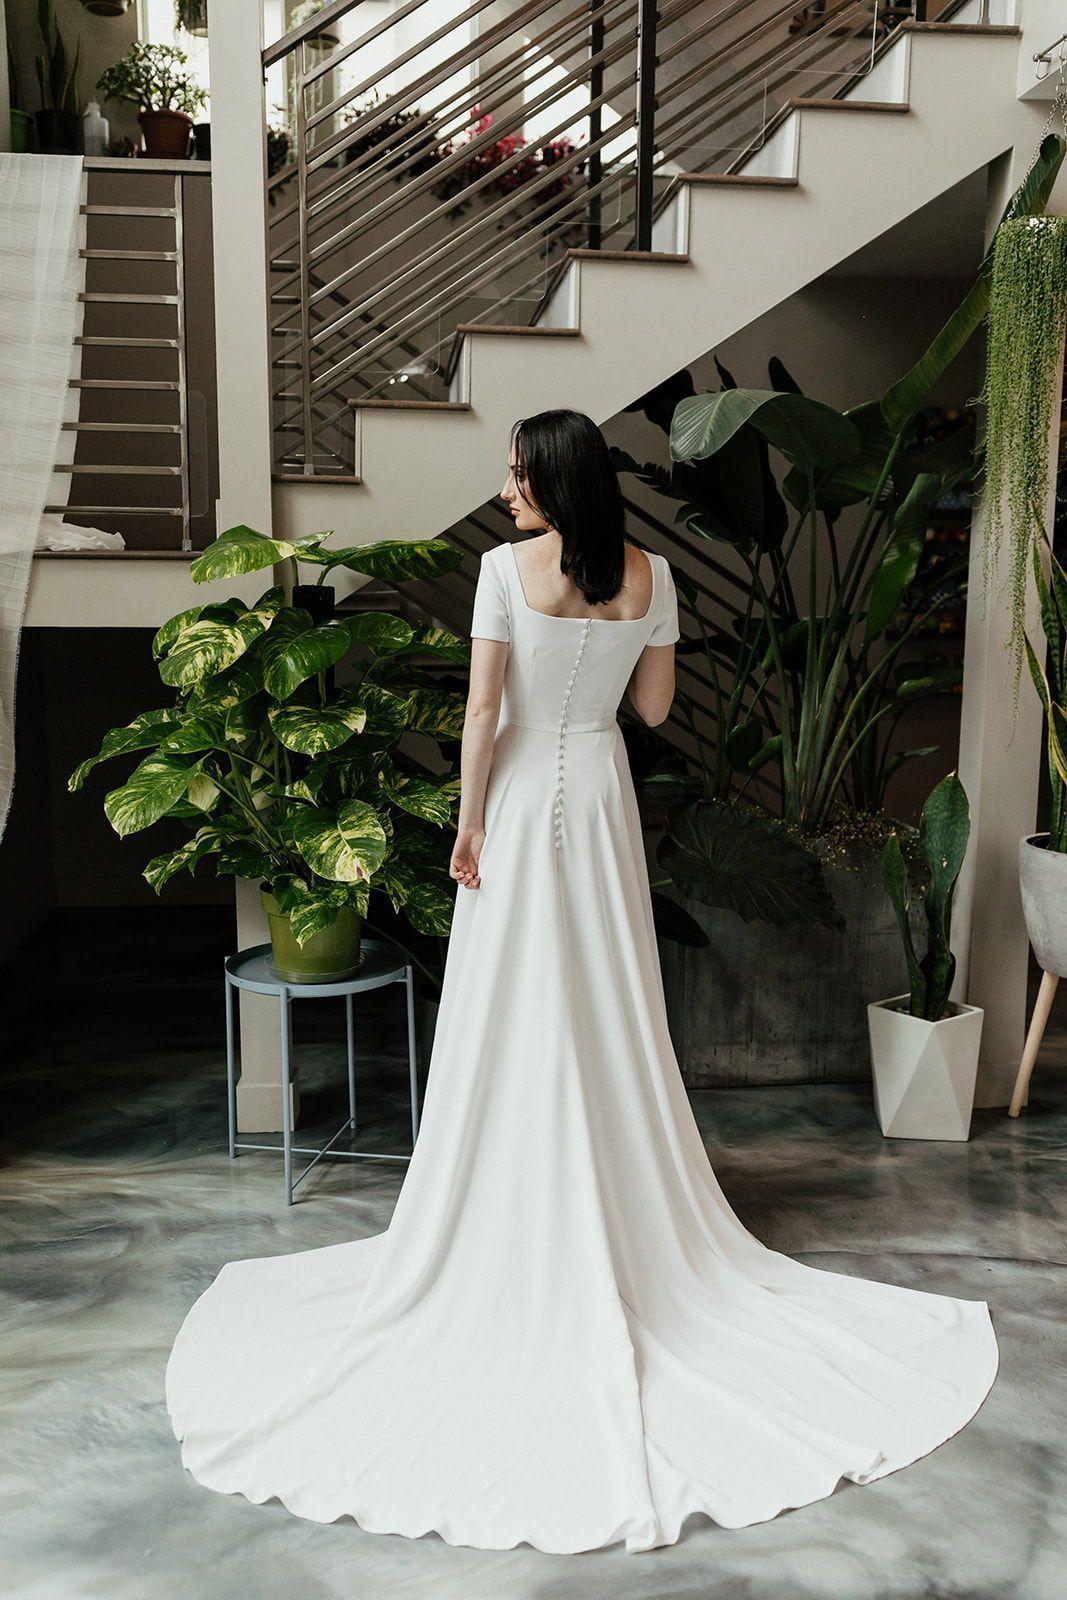 Plus Size Wedding Dresses Champagne Modest Wedding Dress Crepe Wedding Dress Short In 2020 Modest Wedding Dresses Wedding Dress Flowy Short Sleeve Wedding Dress